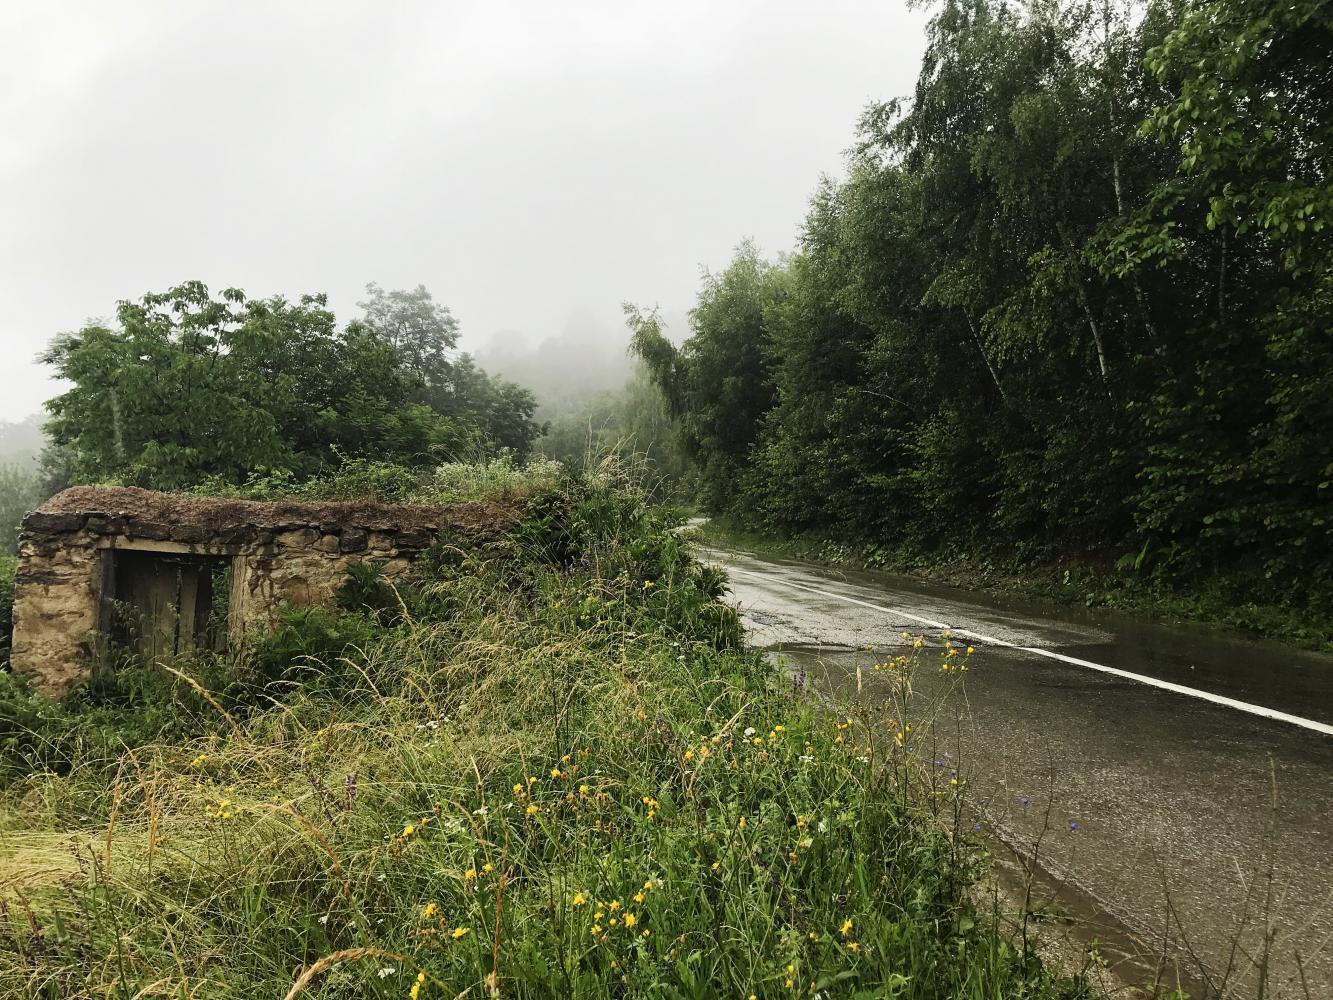 Rogacica-Vincina voda Bike Climb - PJAMM Cycling